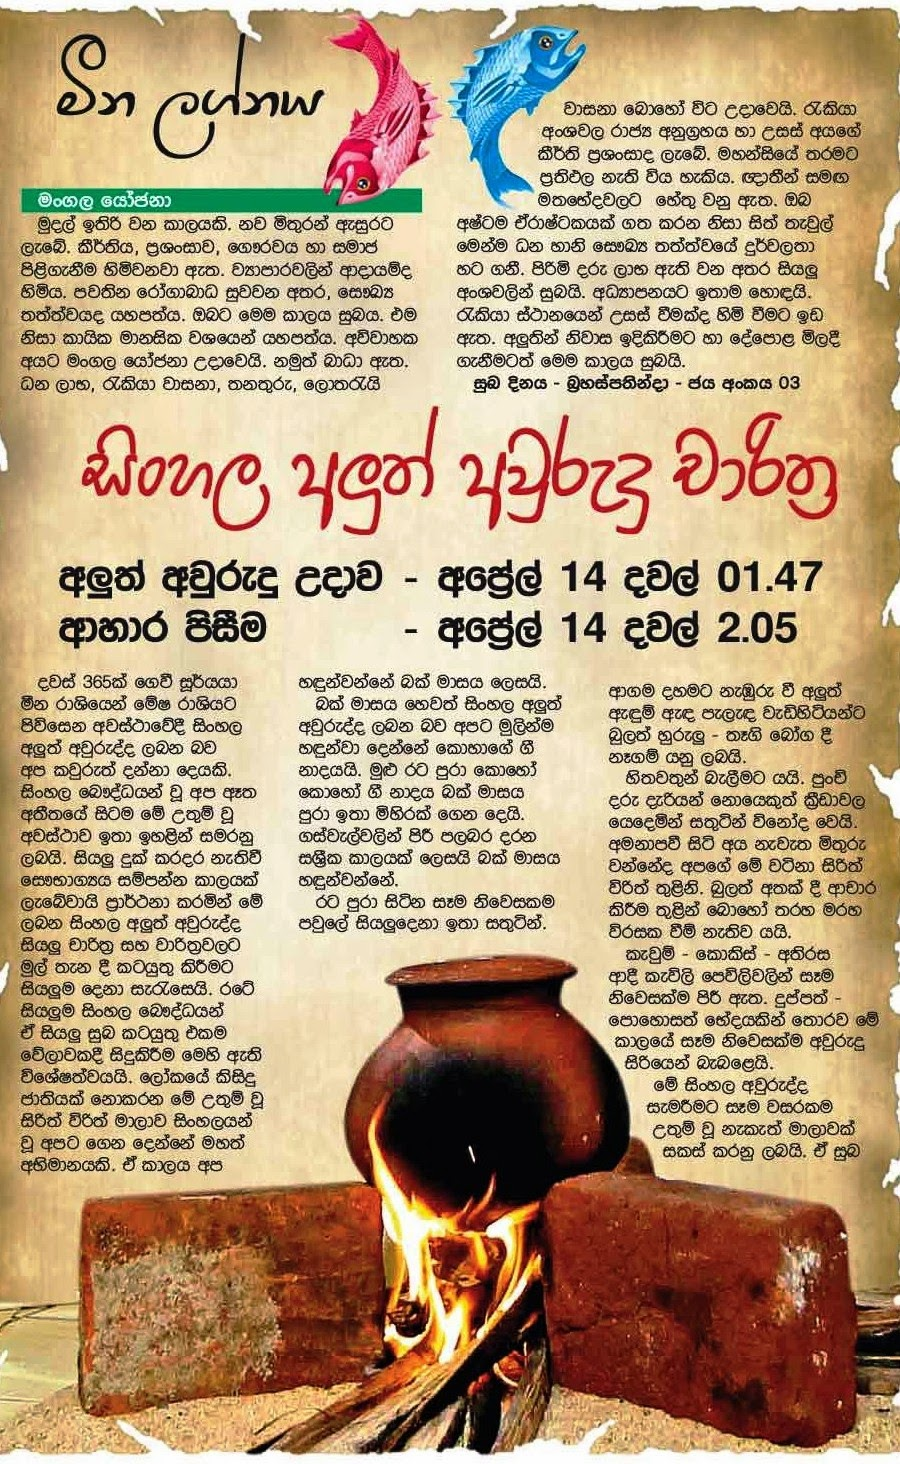 22 sinhala new year 2015 april sinhala tamil new year 2015 sihala ...